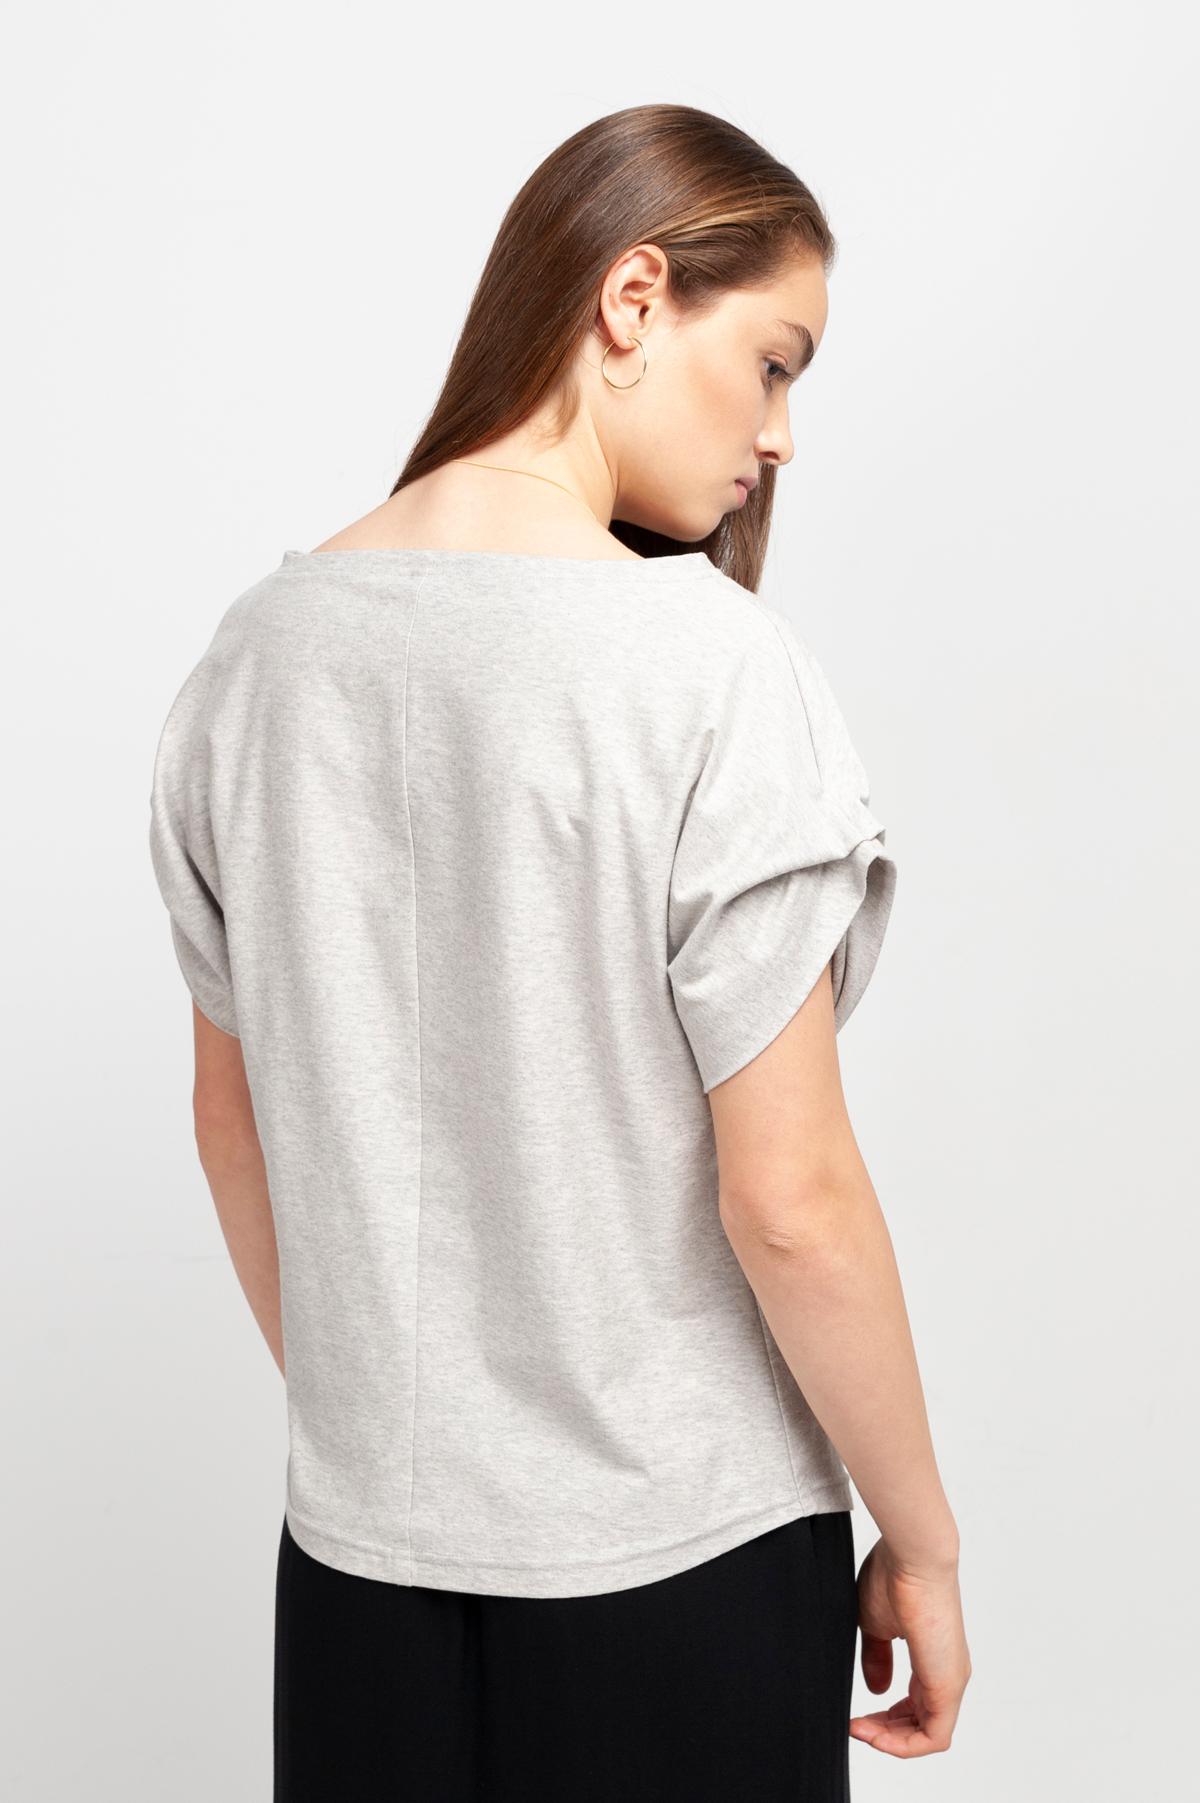 Roberta Organic Fashion Shipsheip T Shirt Ellie Blouse Grau Meliert (2)